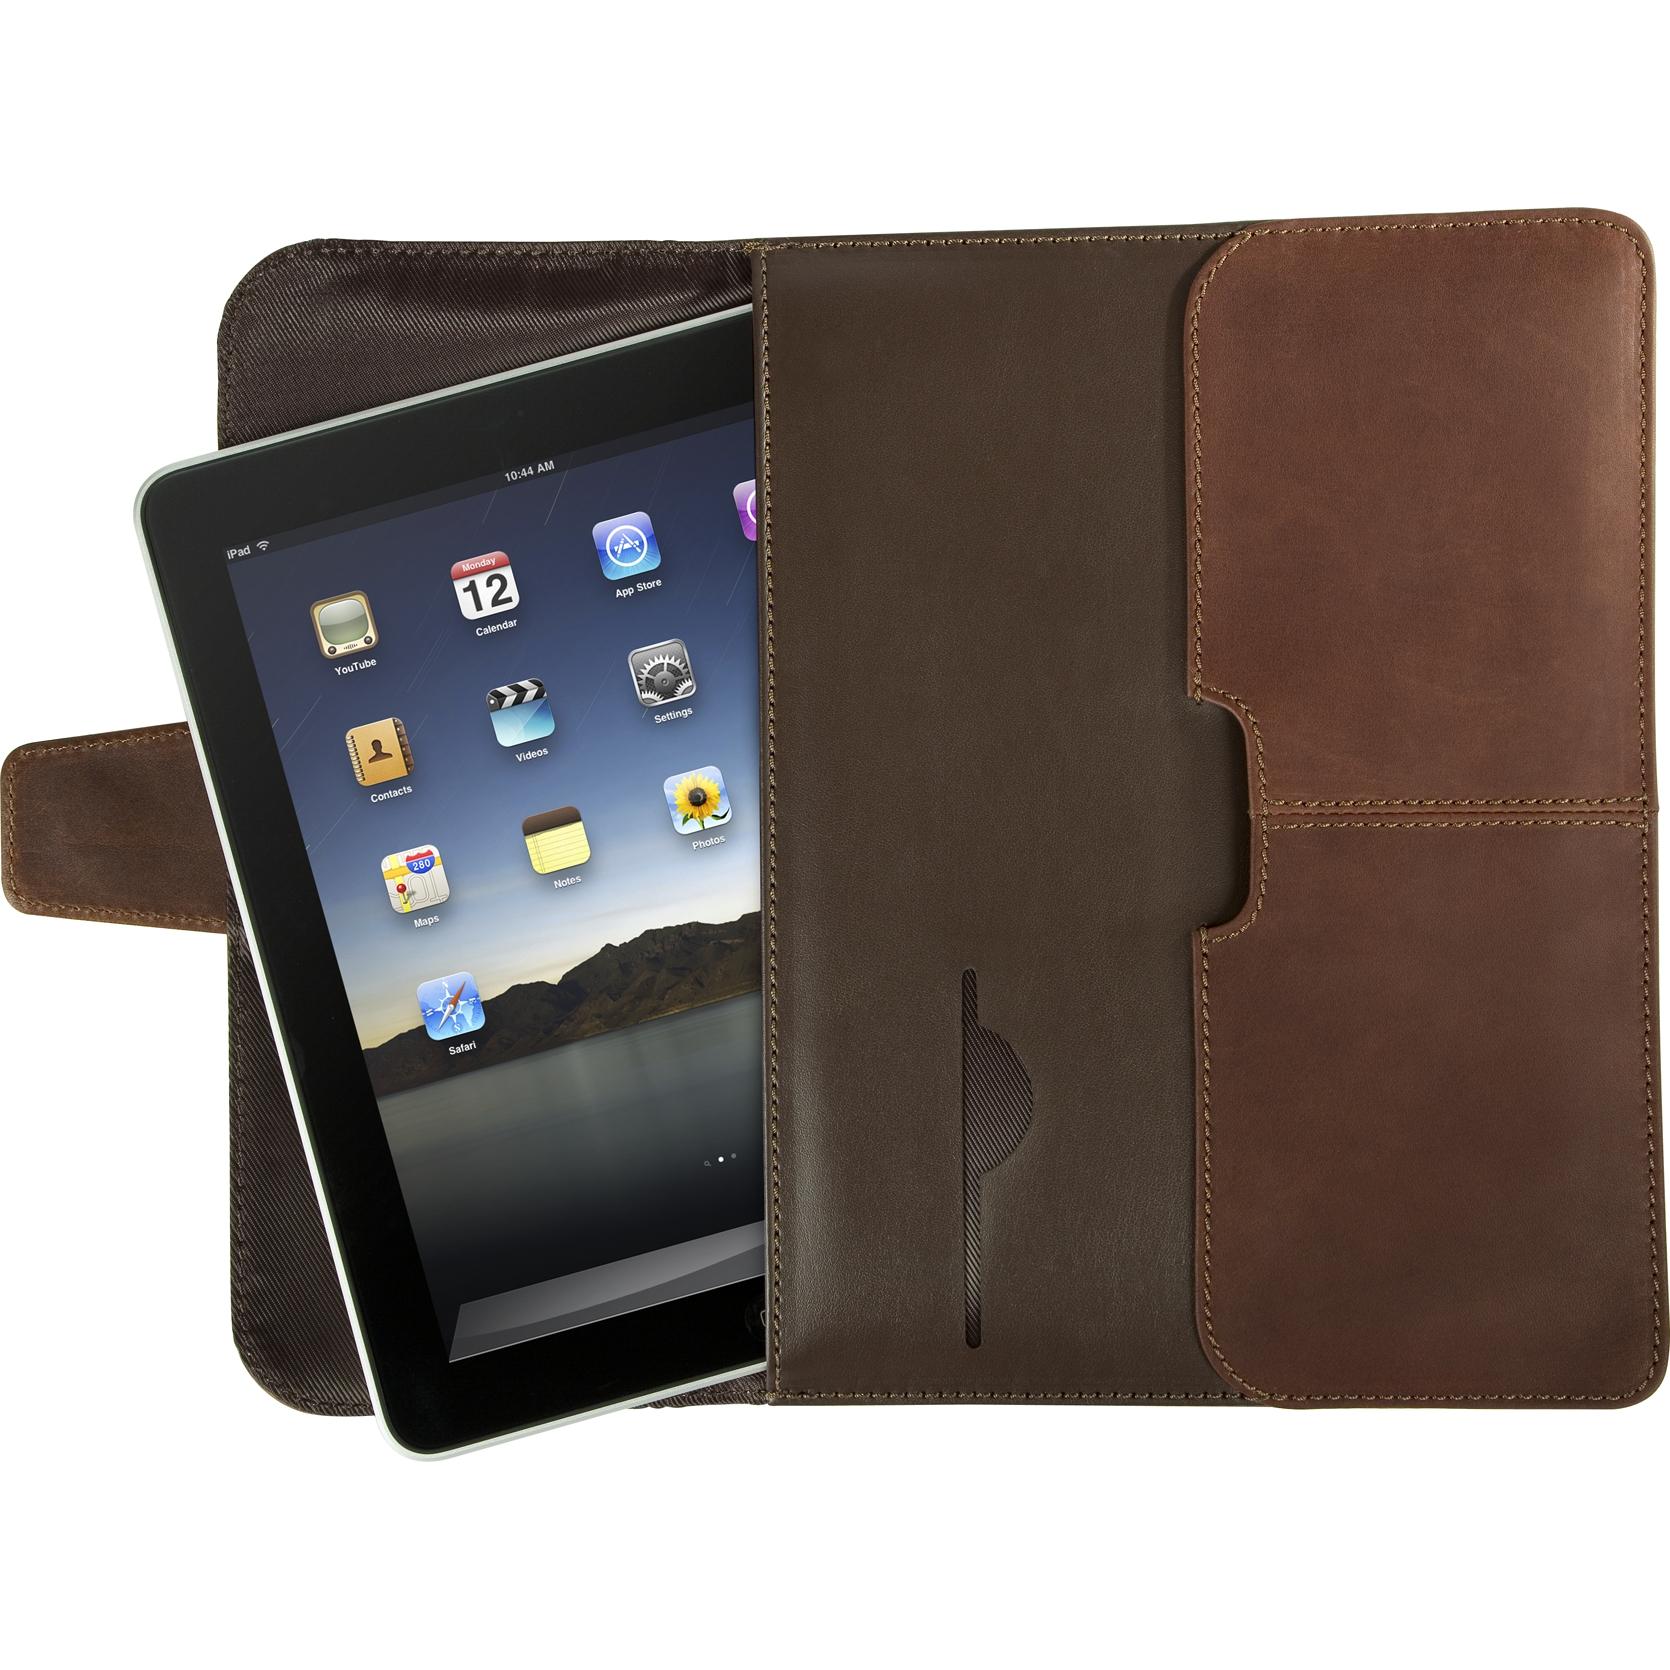 Hughes Leather Portfolio Slipcase For Ipad Tes01001us